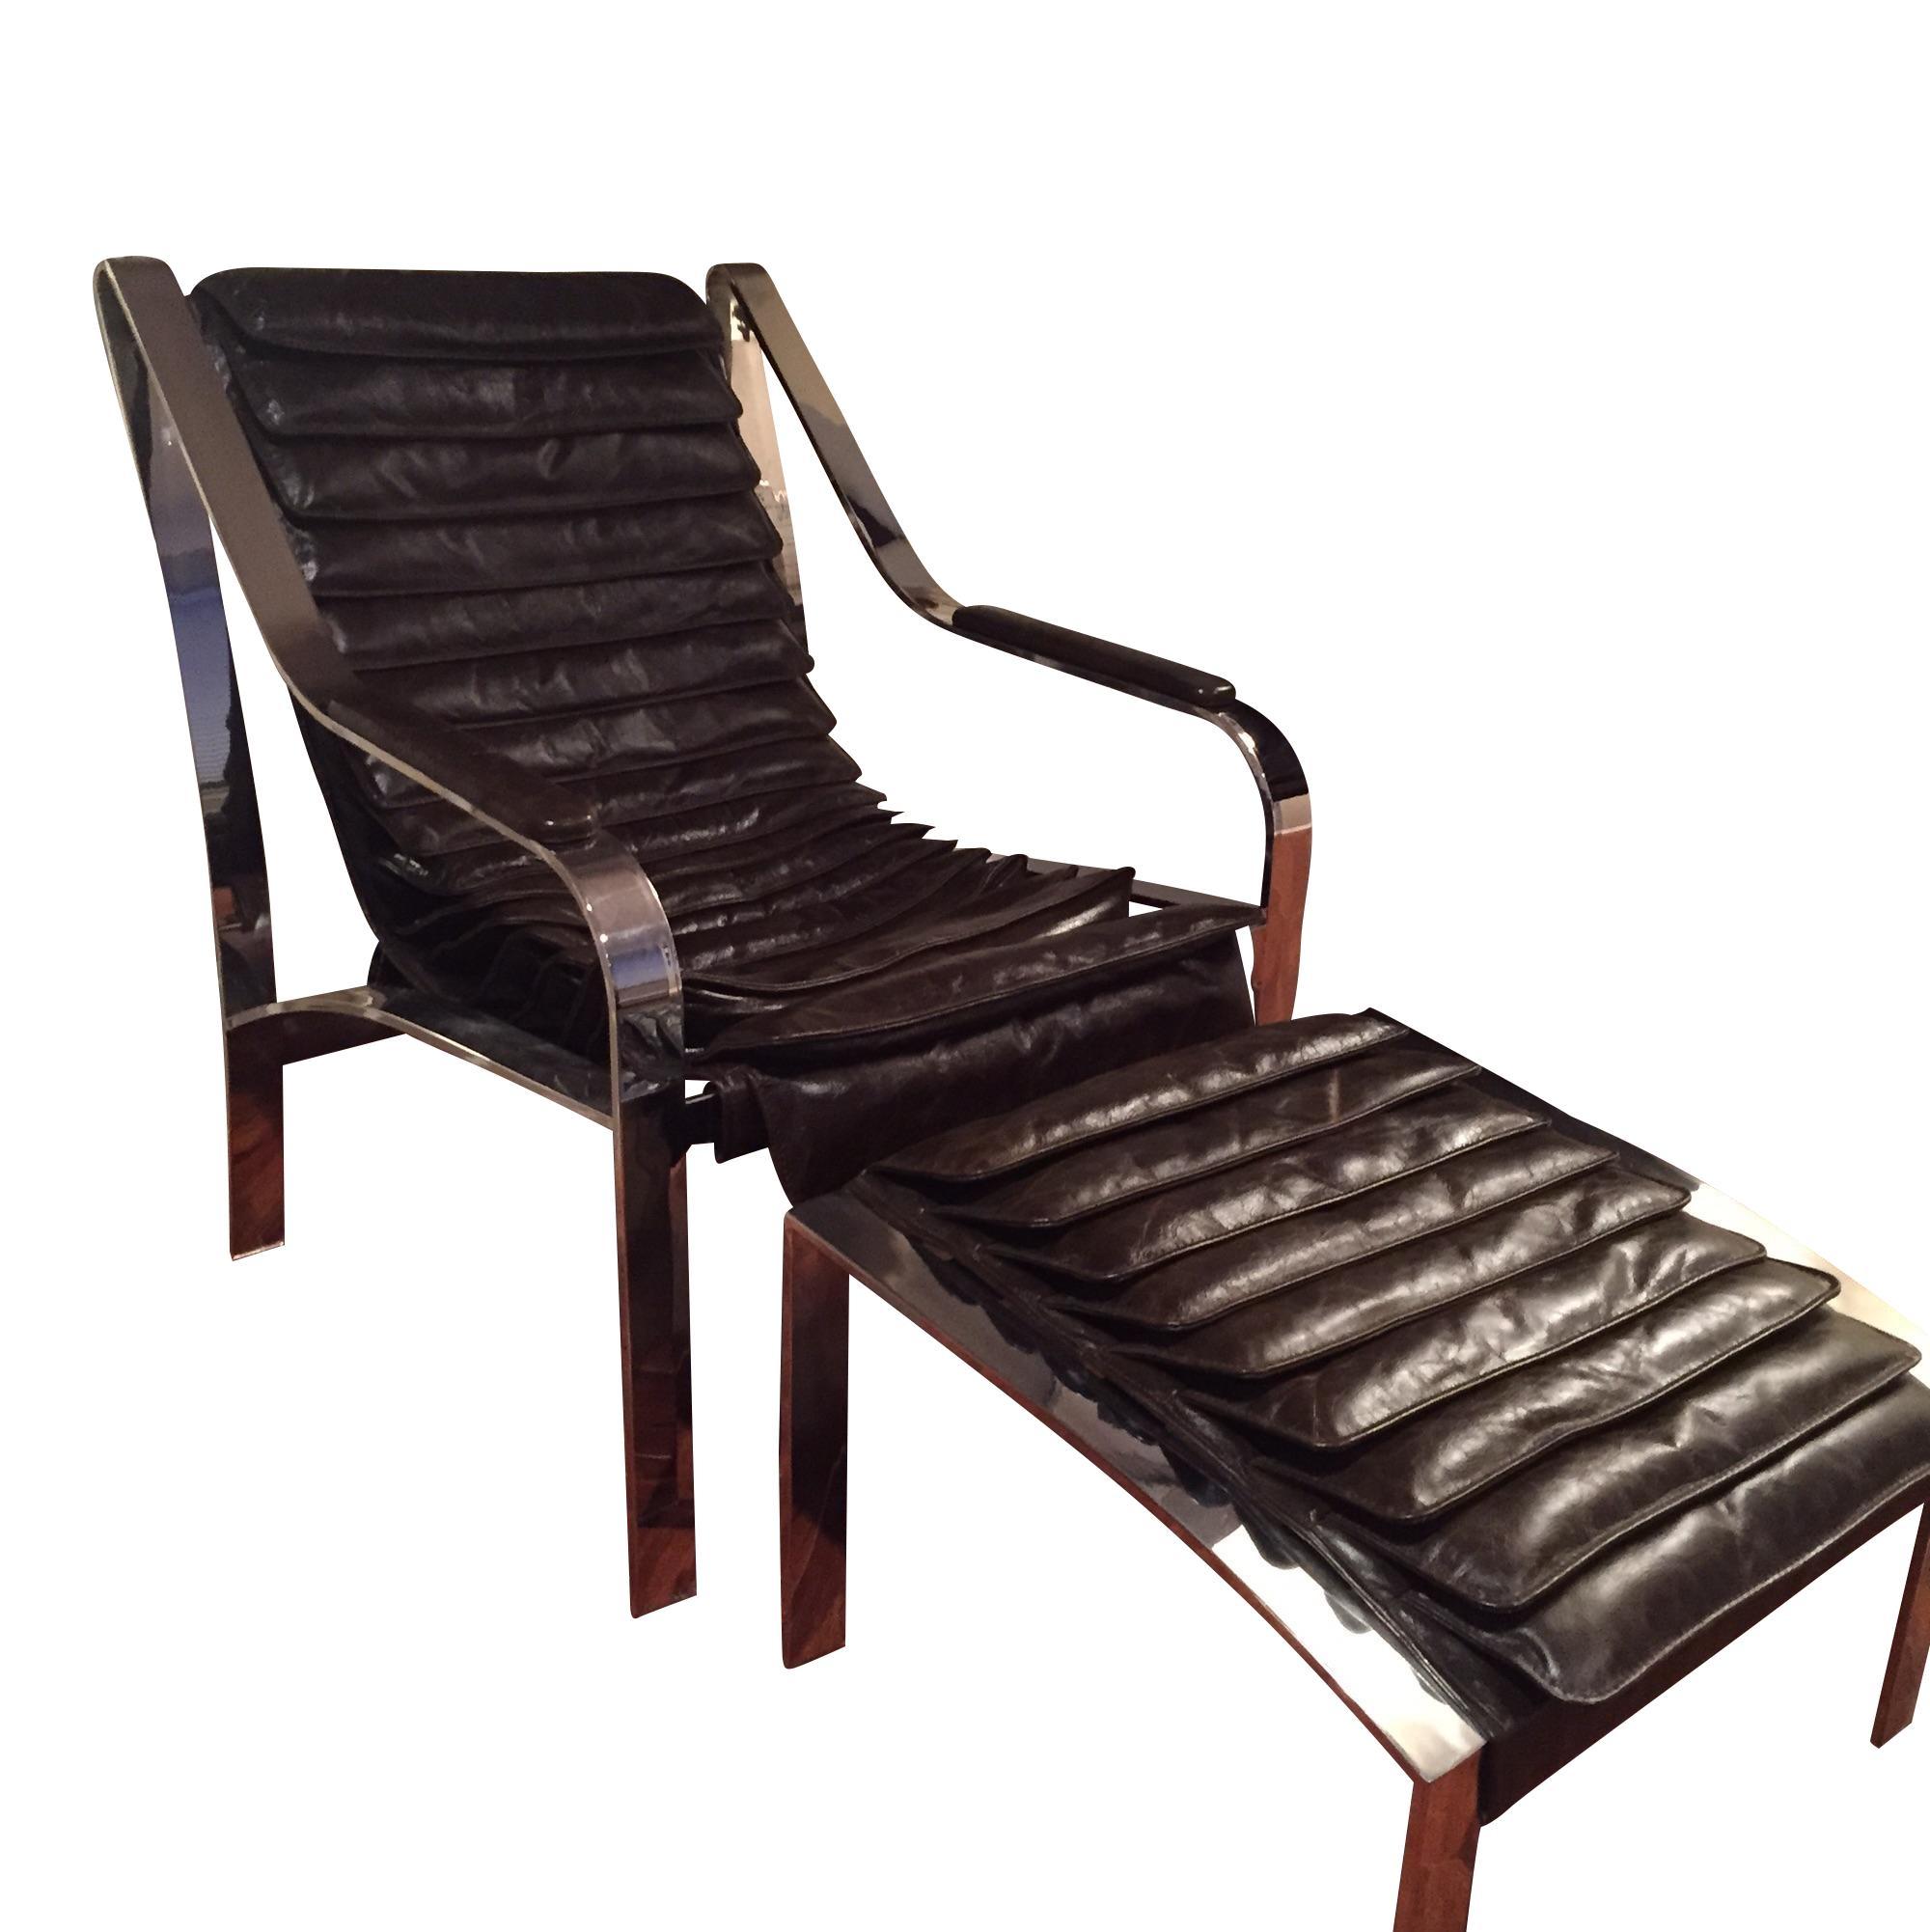 Arhaus Leather Sofa With Ideas Photo 24990   Kengire With Arhaus Leather Sofas (View 16 of 20)